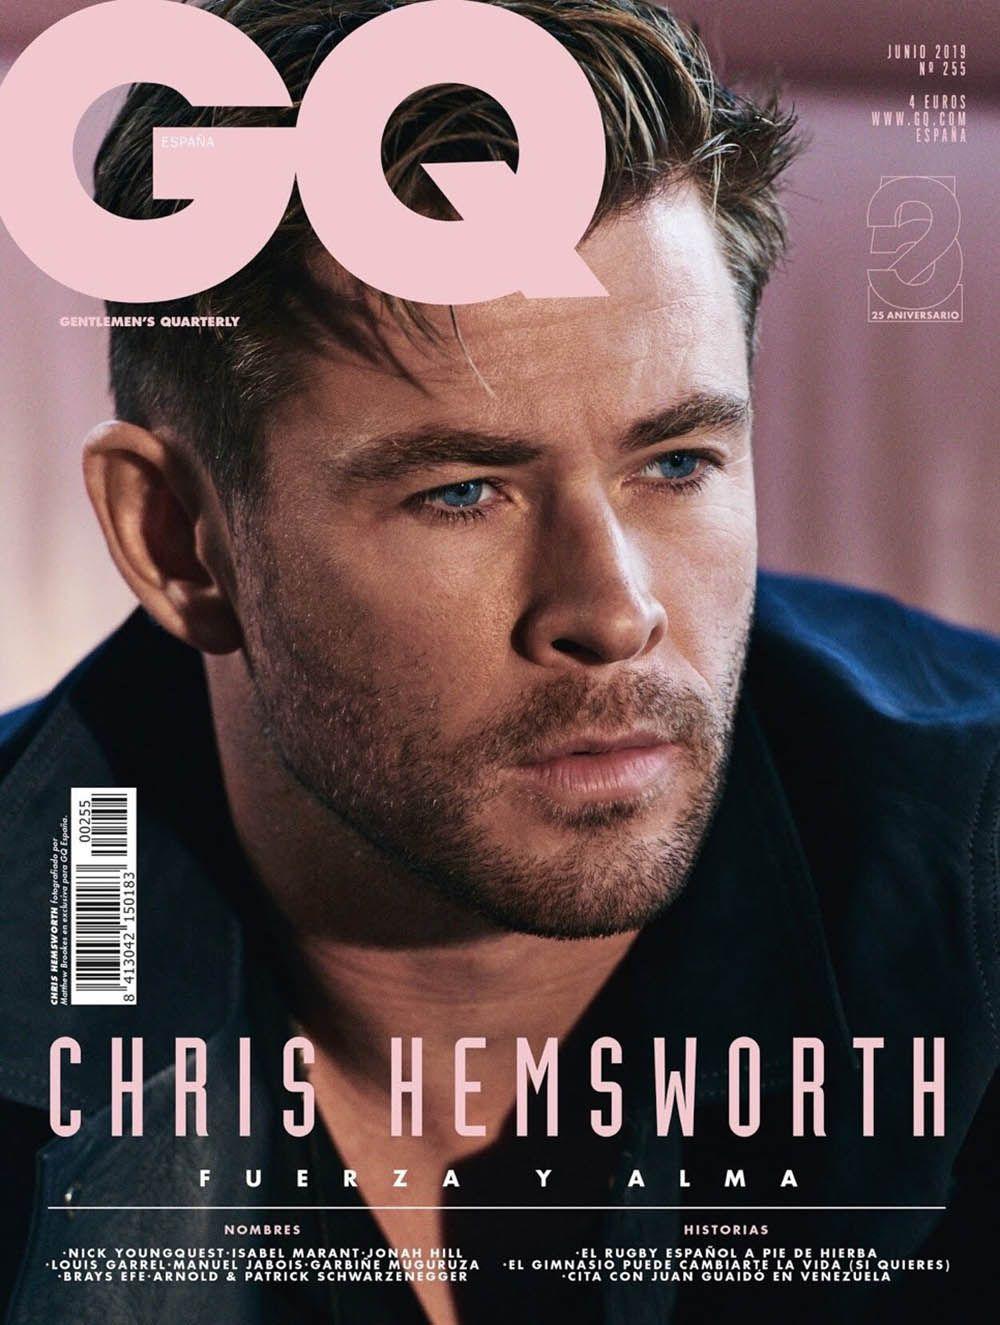 Chris Hemsworth covers GQ Spain June 2019 by Matthew